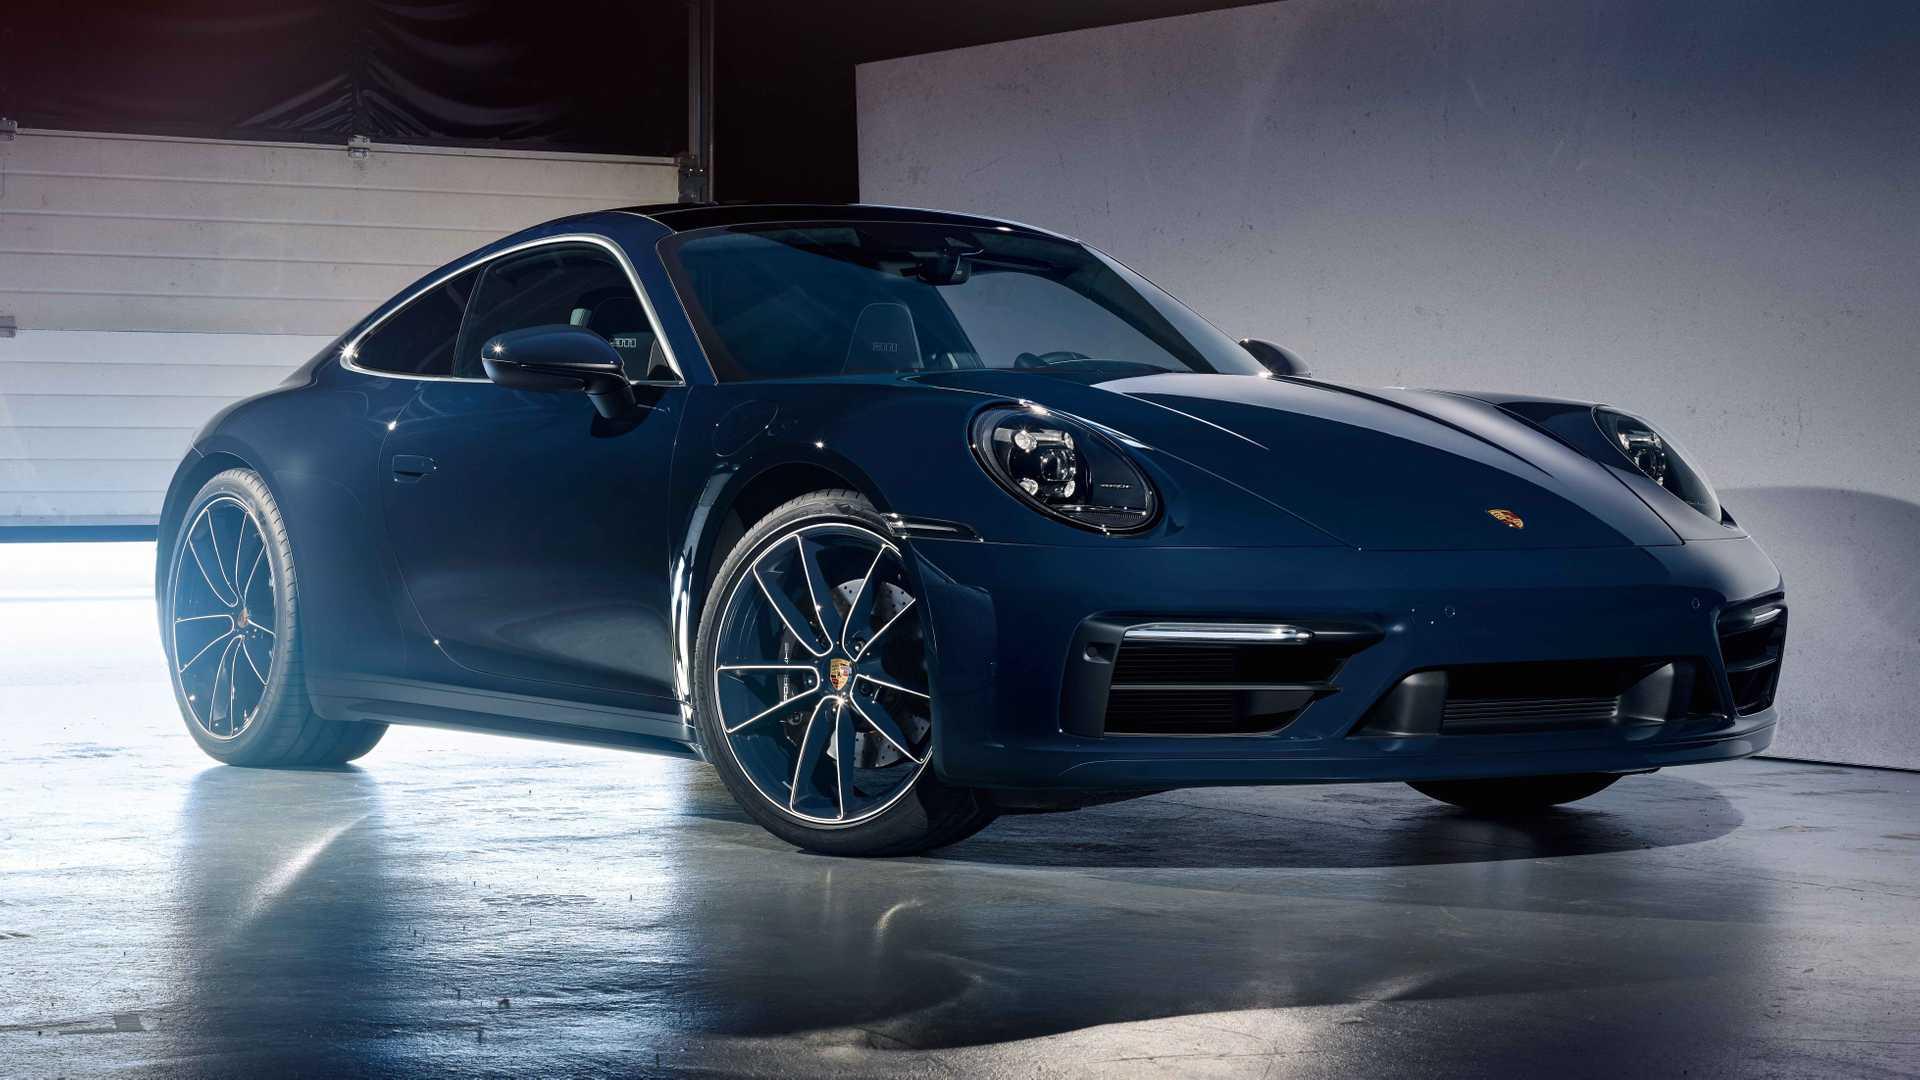 2020-porsche-911-belgian-legend-edition-1